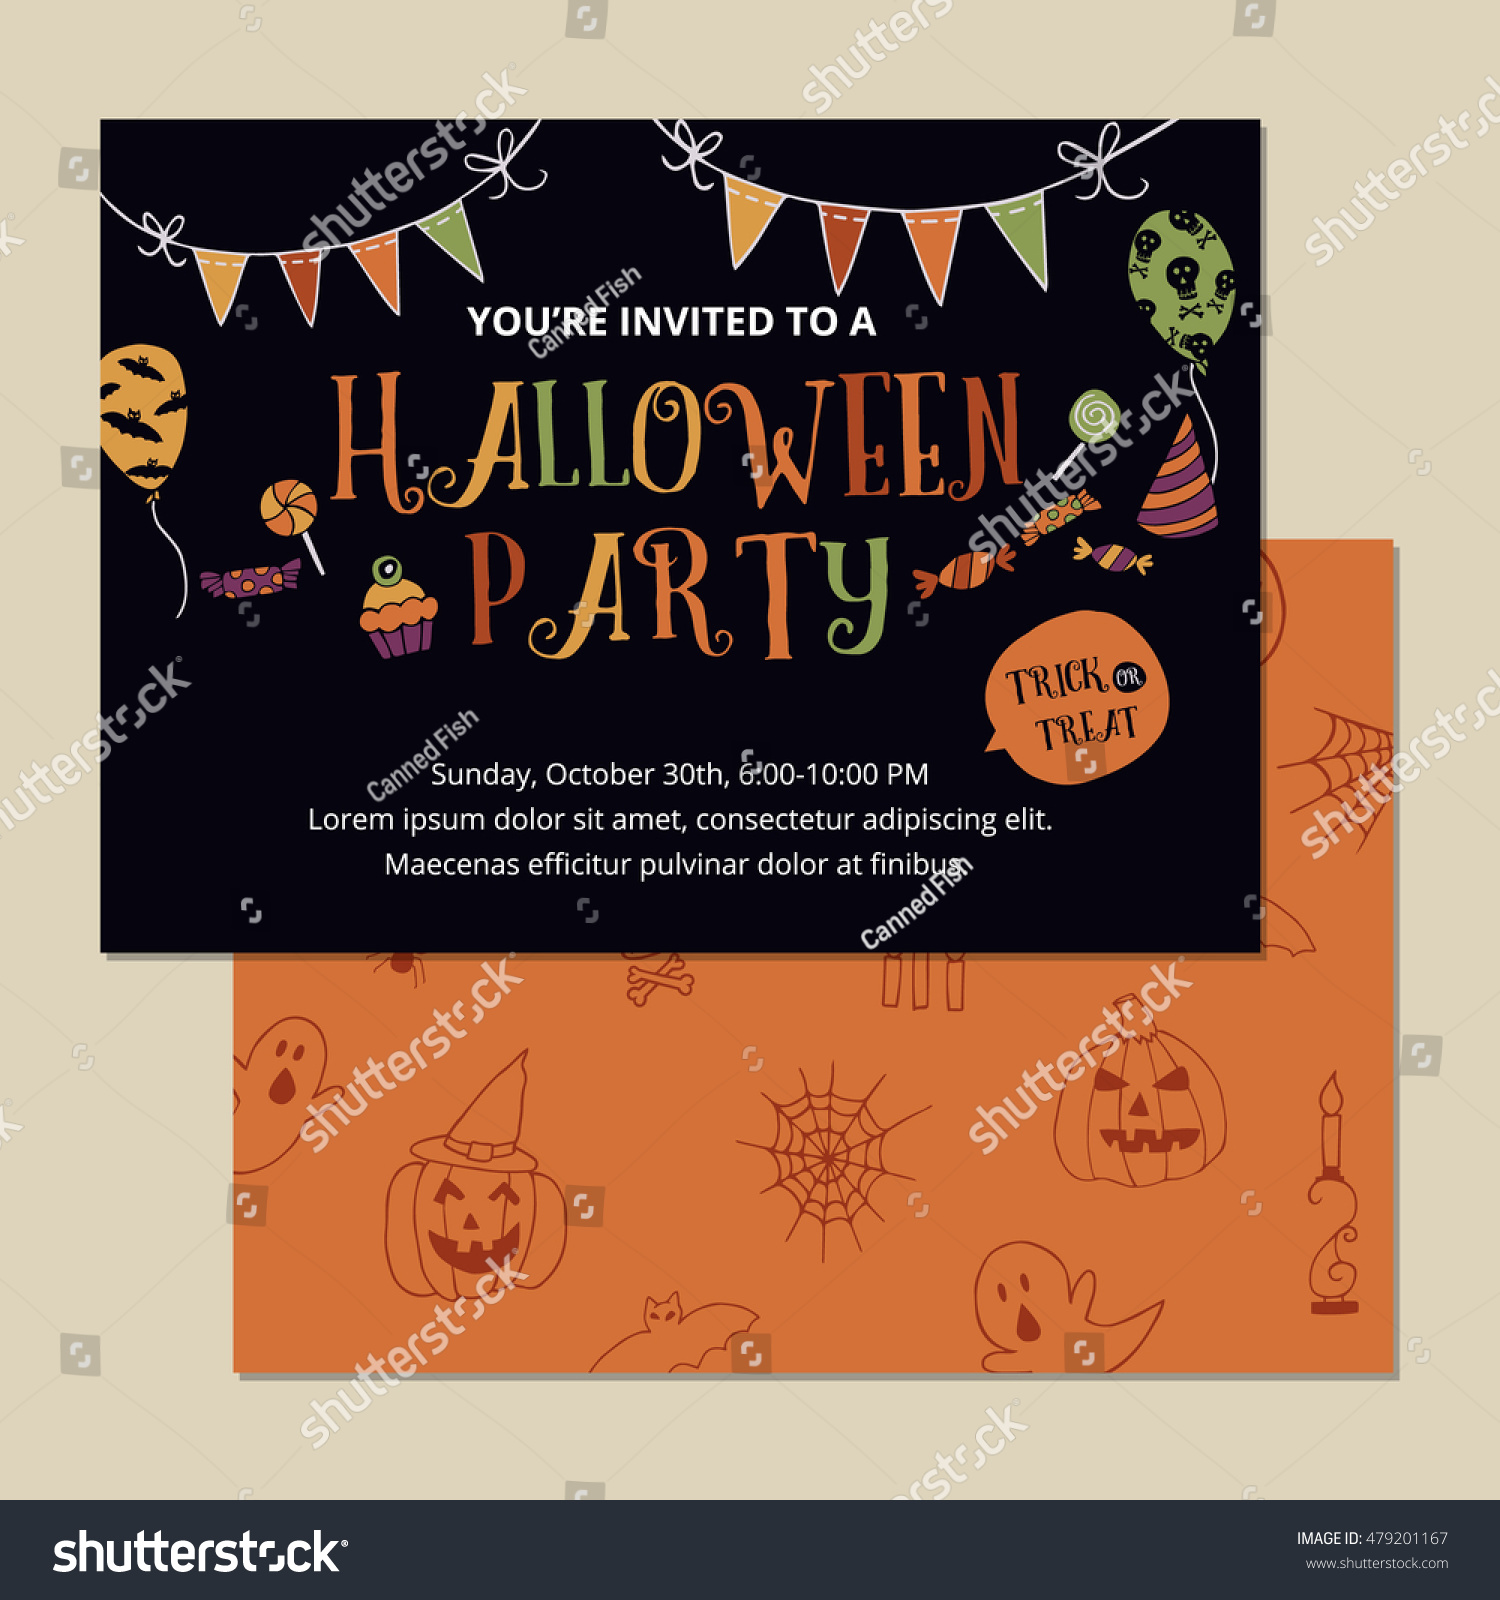 Halloween Party Invitation Card Design Template Stock Vector ...